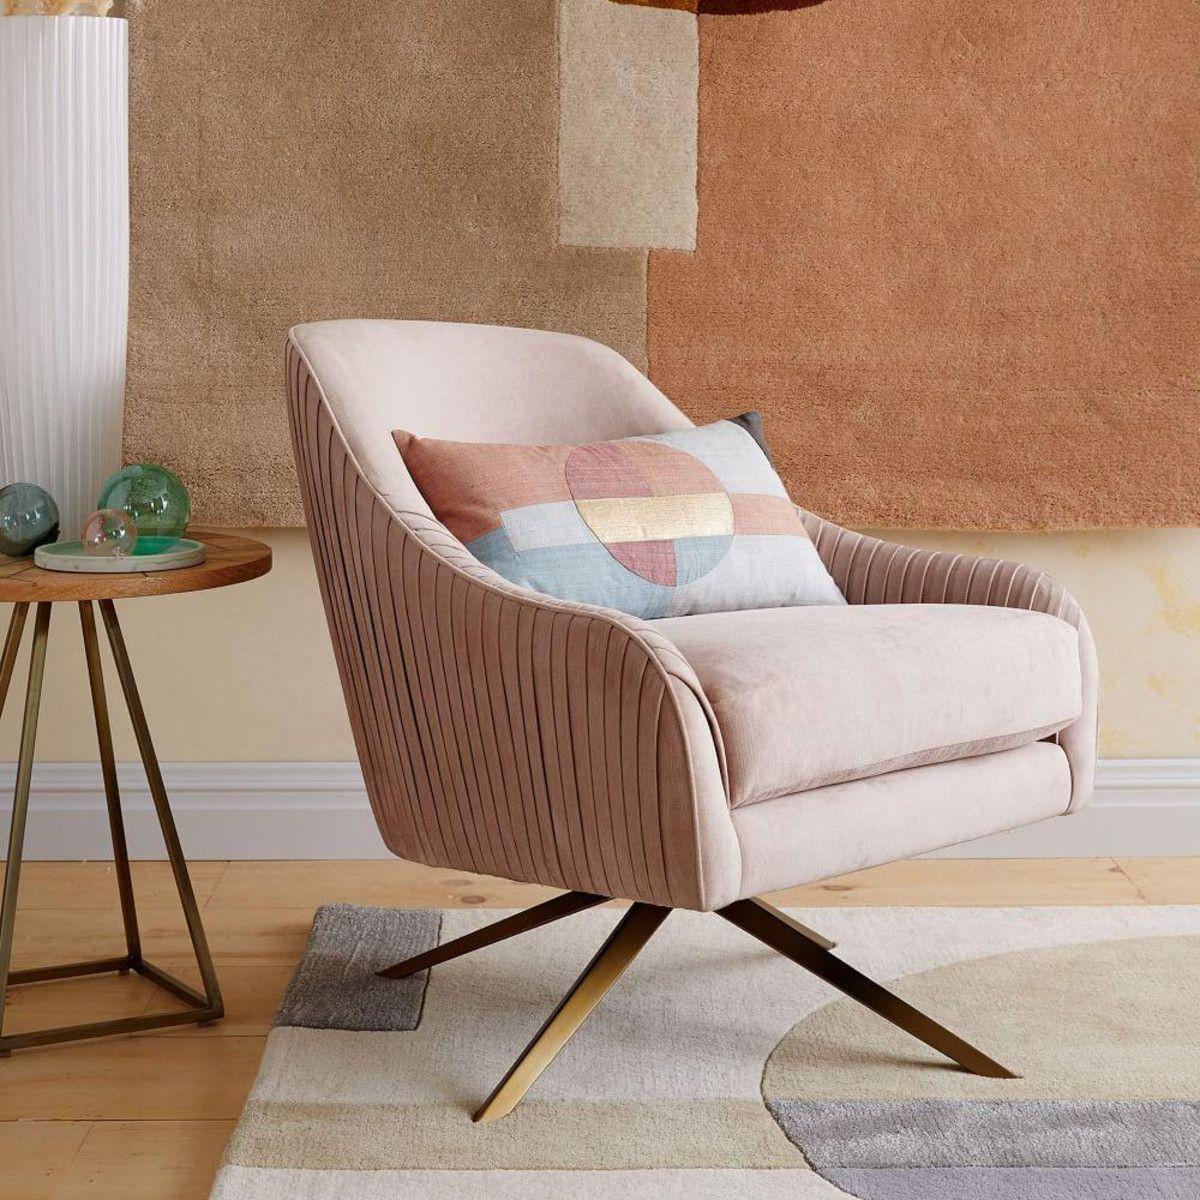 Roar + Rabbit Swivel Chair From Westelm. Soft Velvet Pastel Pink. Brass Legs